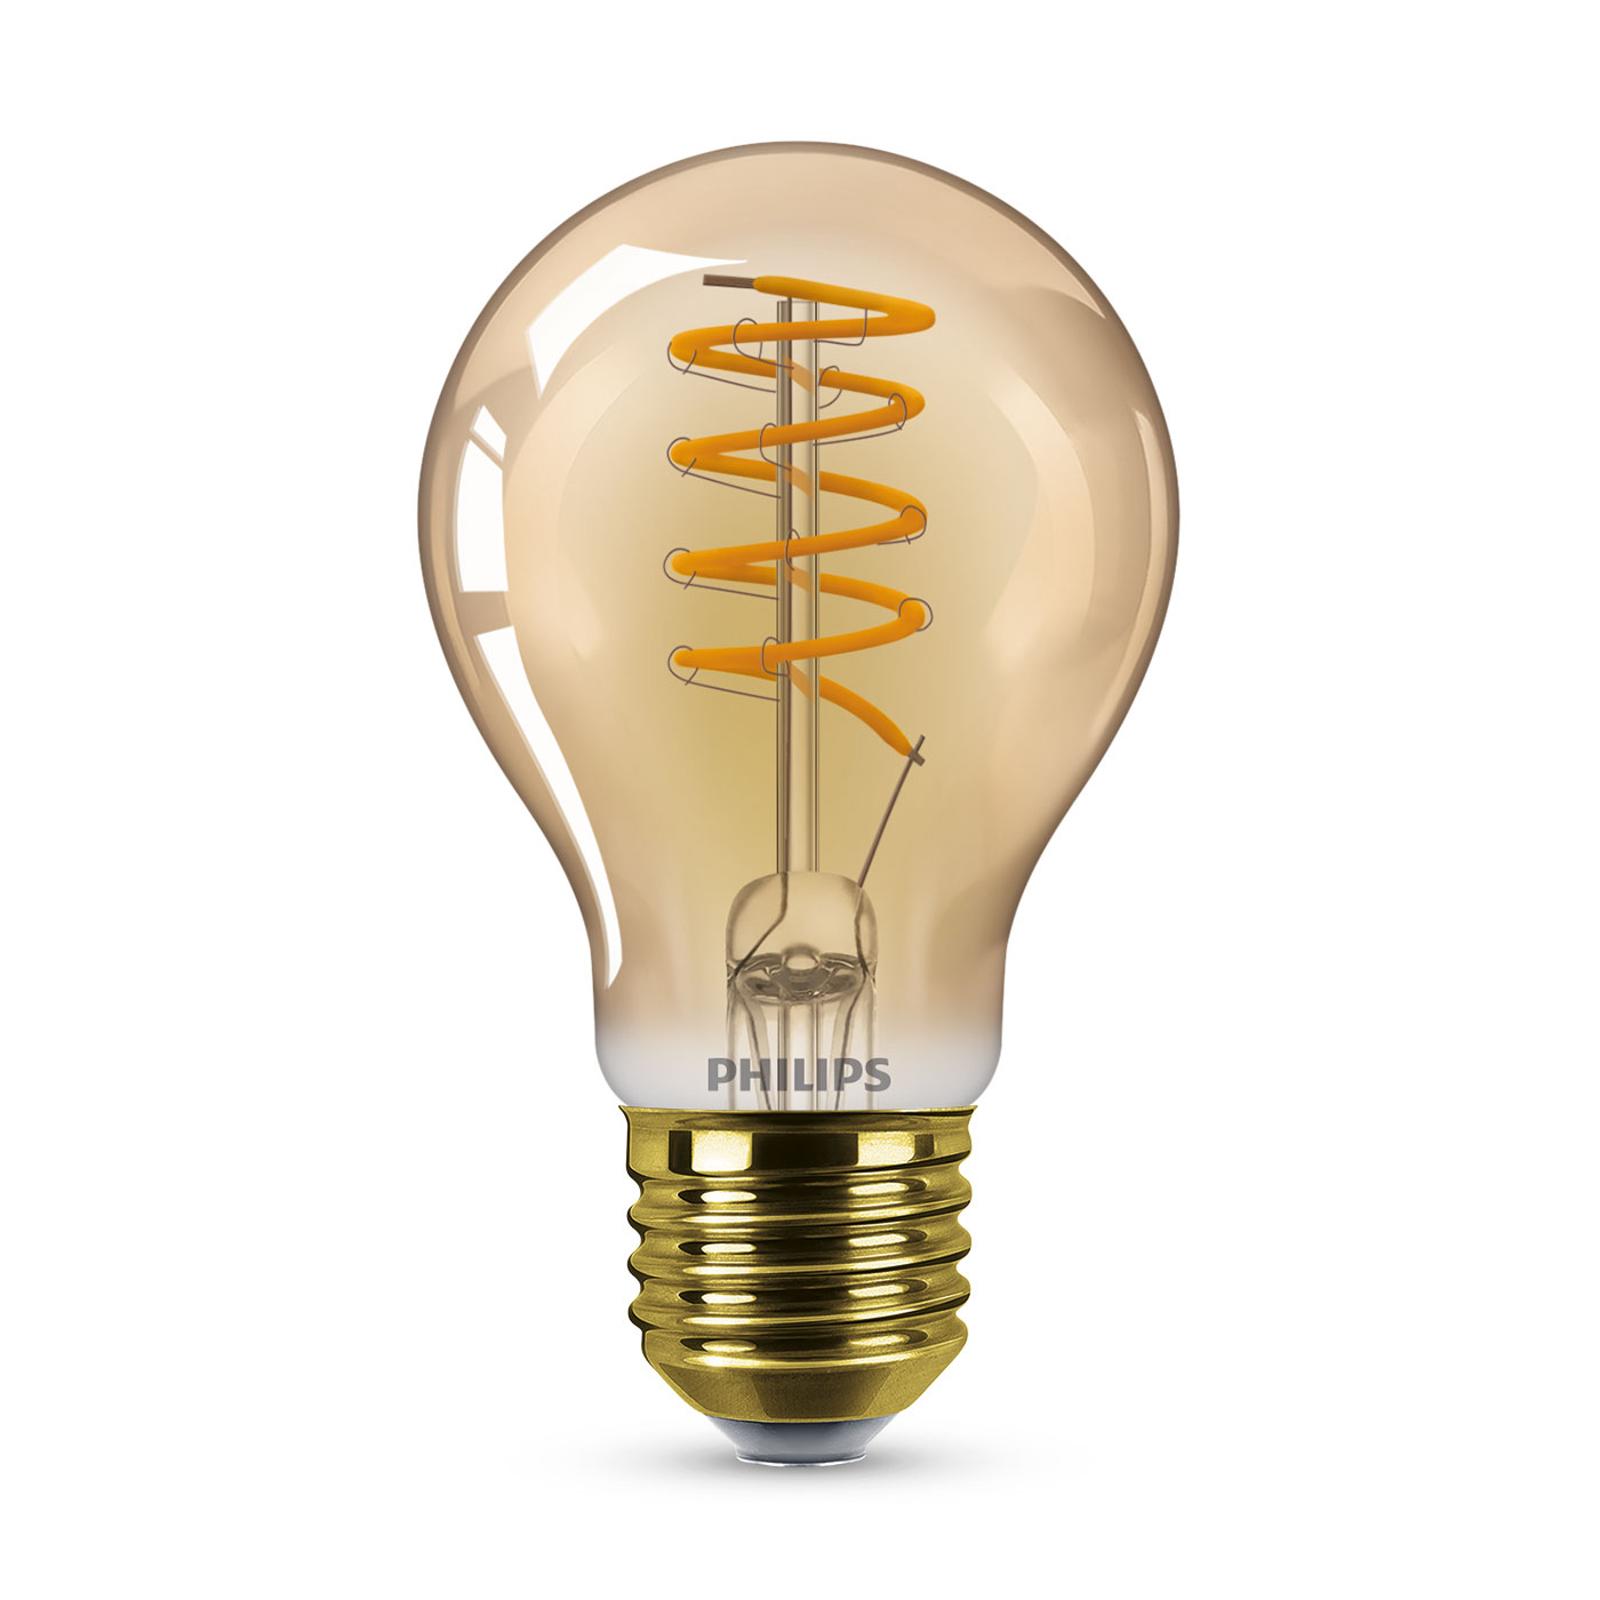 Philips LED-Lampe E27 A60 5,5W 2.000K gold dimmbar